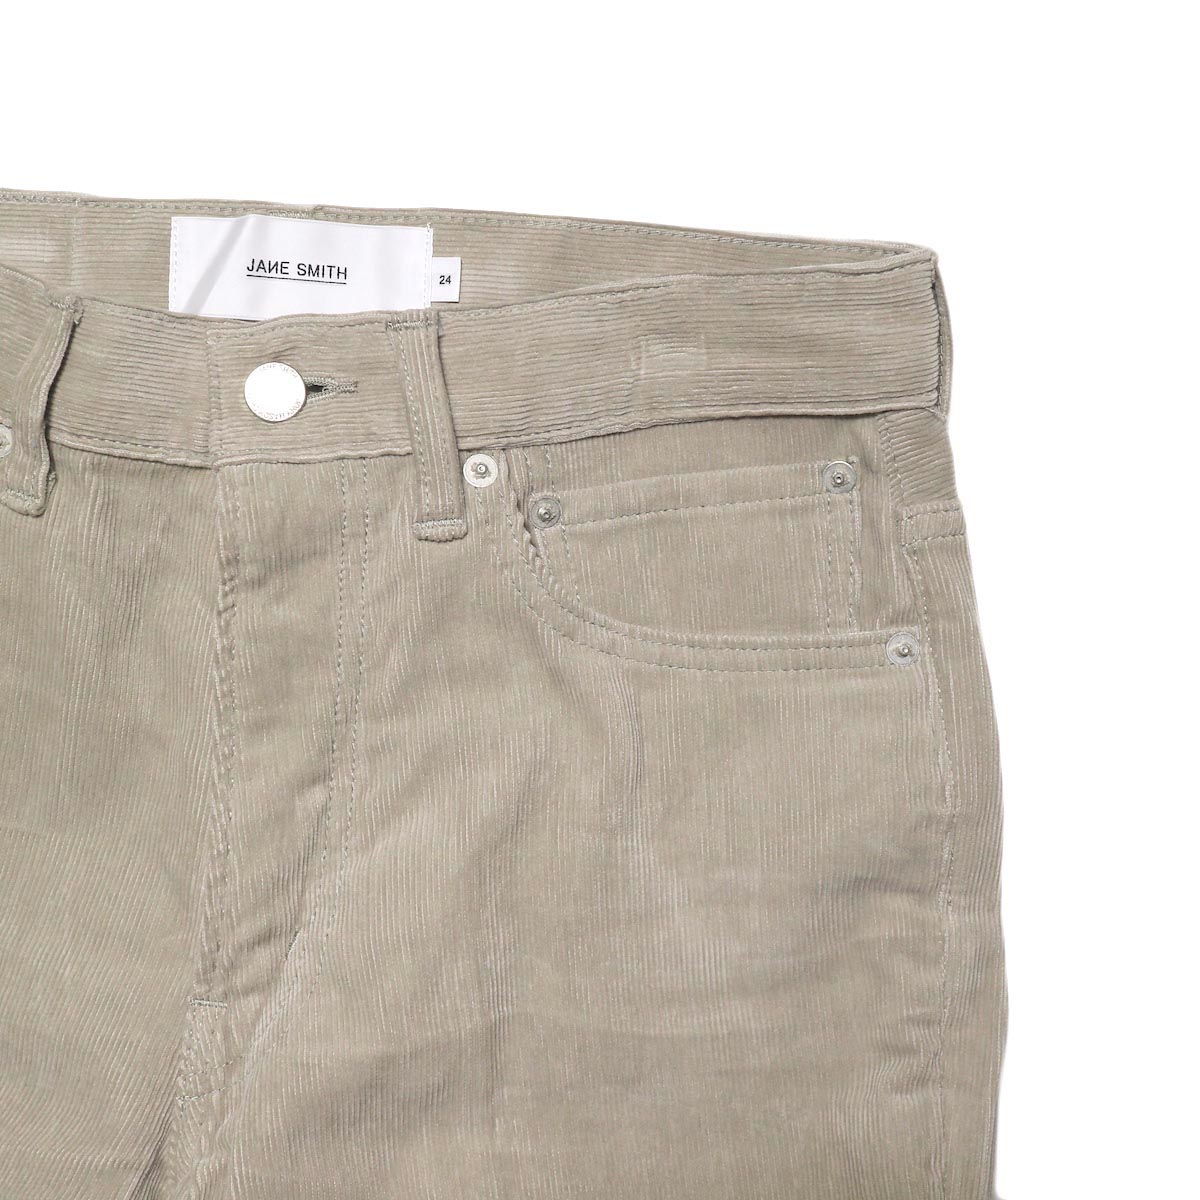 JANE SMITH / 5POCKET BOOTSCUT (fawn beige) チェンジポケット